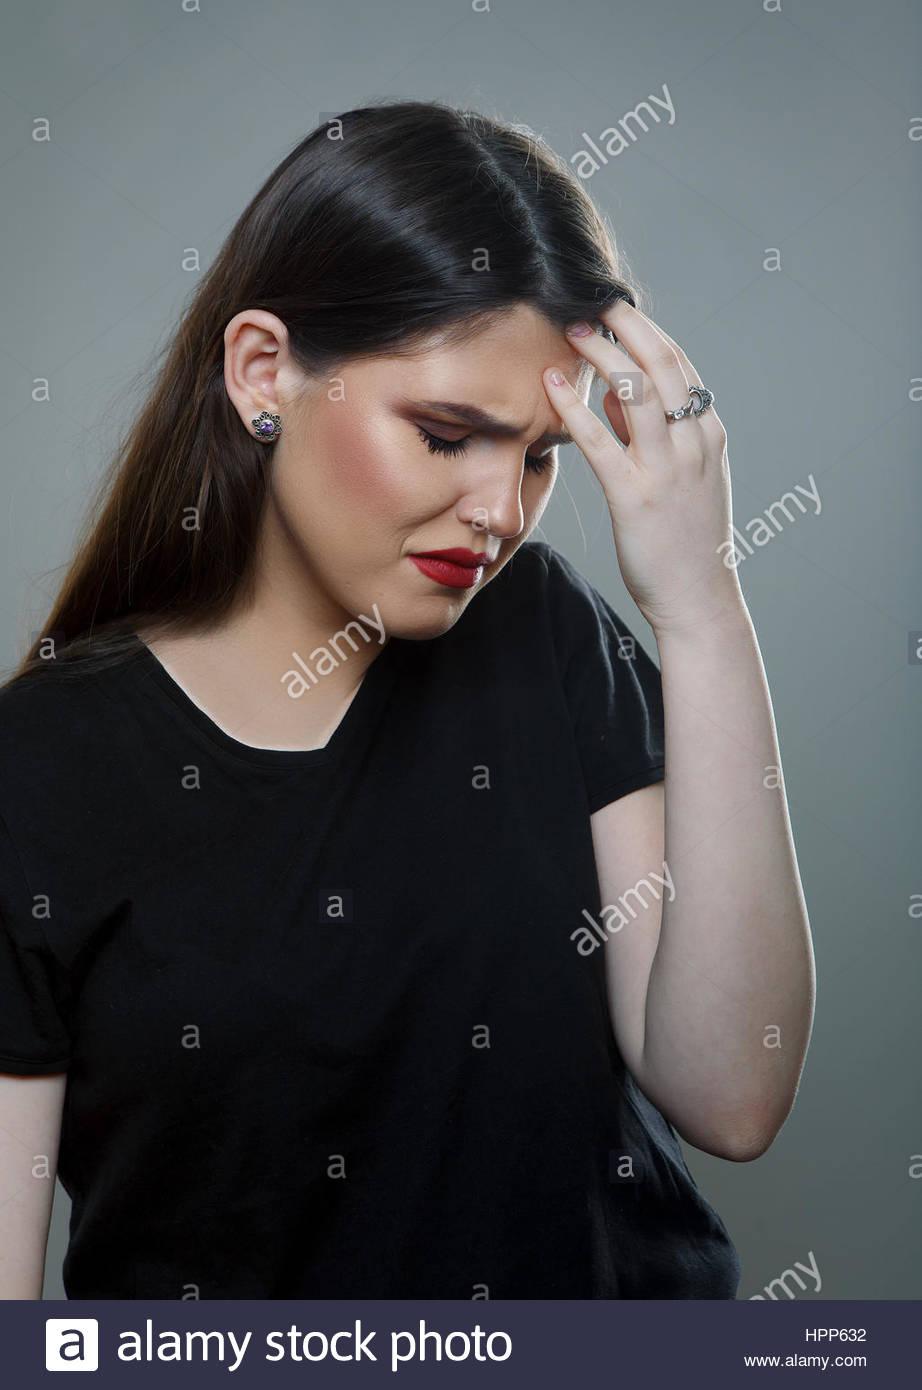 Sad Depressed Girl with Headache - Stock Image